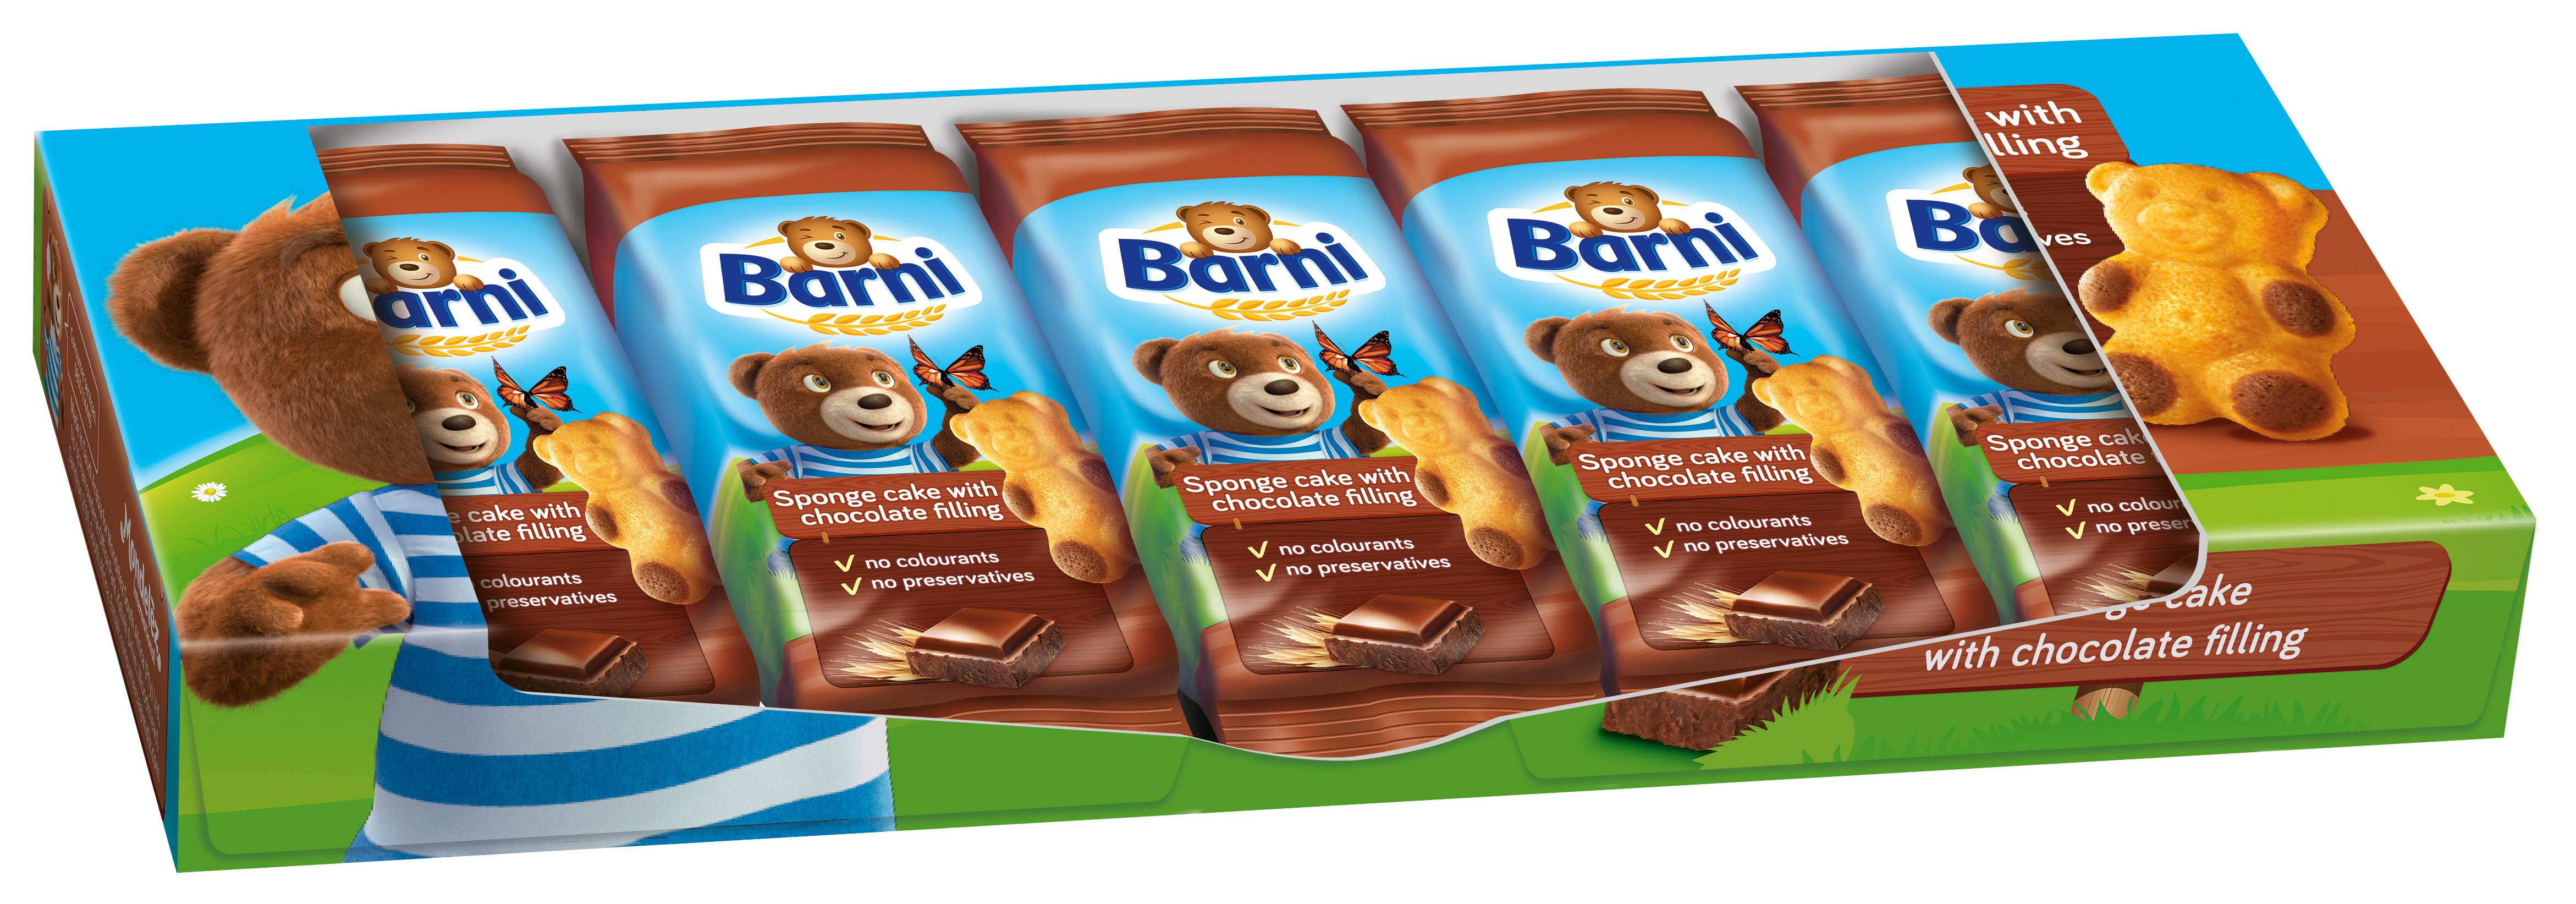 Barni Bear Hamper Giveaway